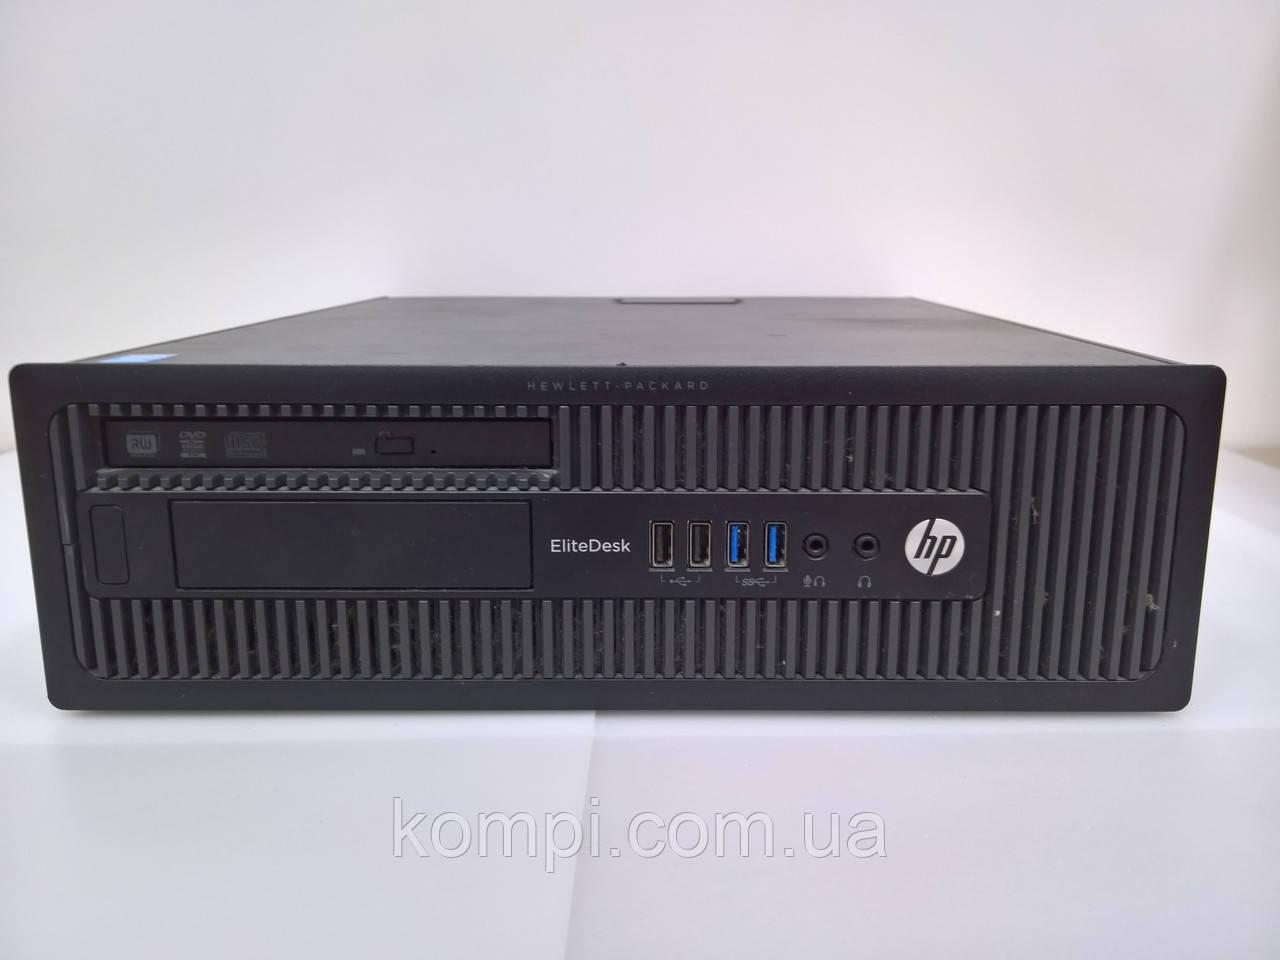 Системний блок HP EliteDesk 800 s1150 (Intel Pentium G3230/ DDR3 4GB/Video INTG/HDD 500gb/DVD RW)